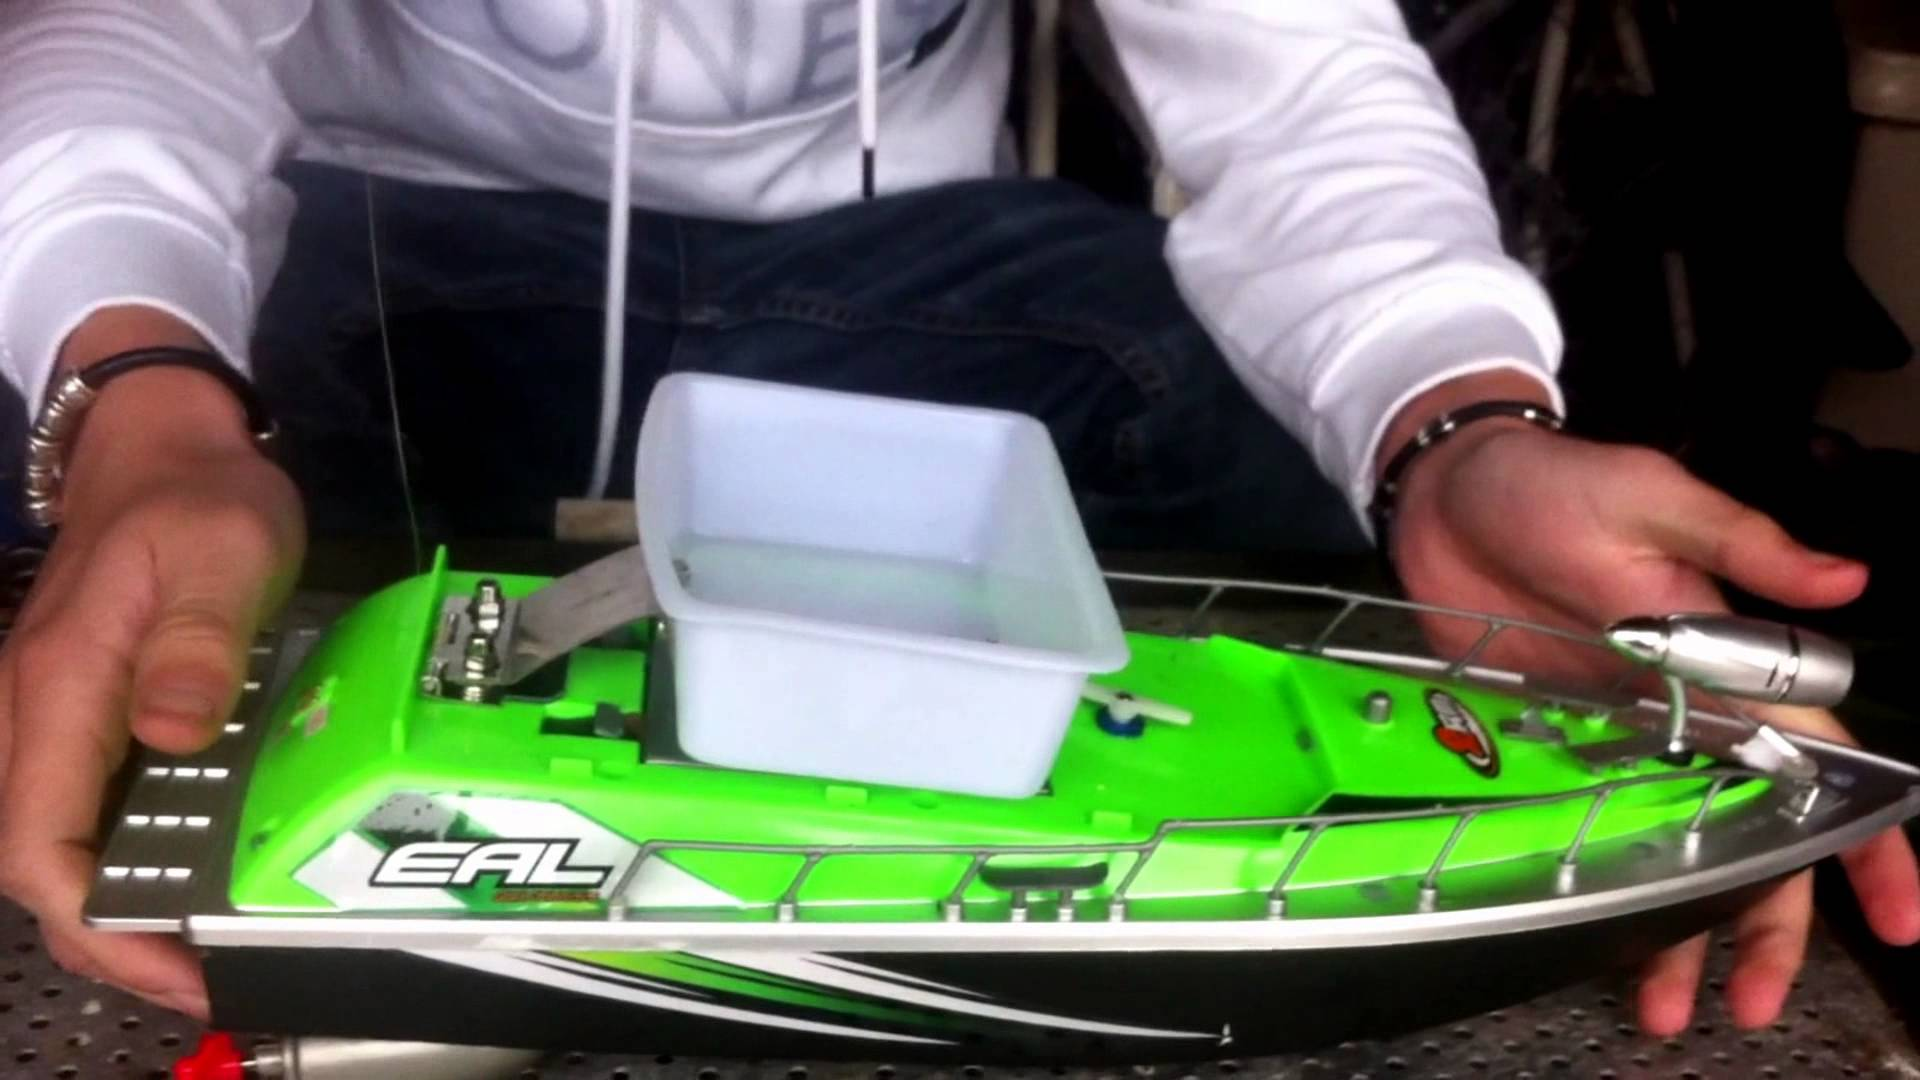 bateau amorceur 200 euros